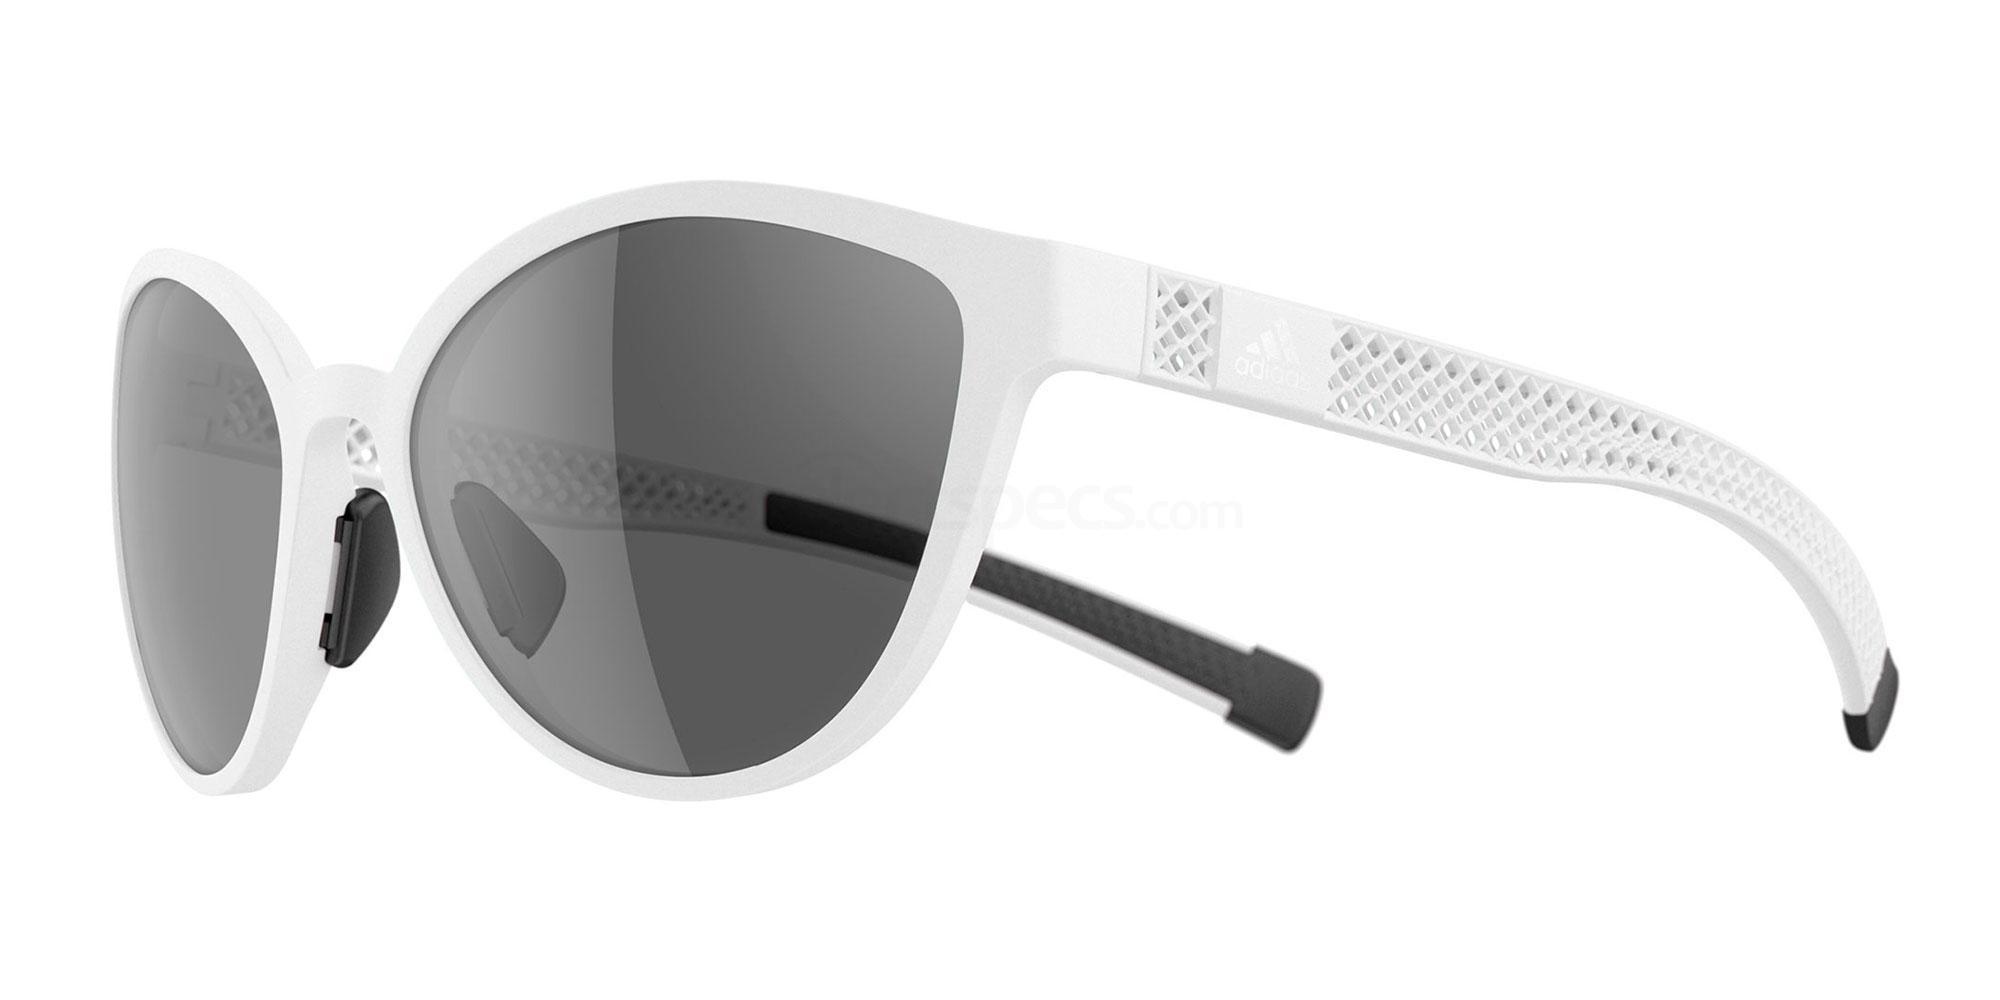 ad37 75 1500 ad37 Tempest 3D_X Sunglasses, Adidas